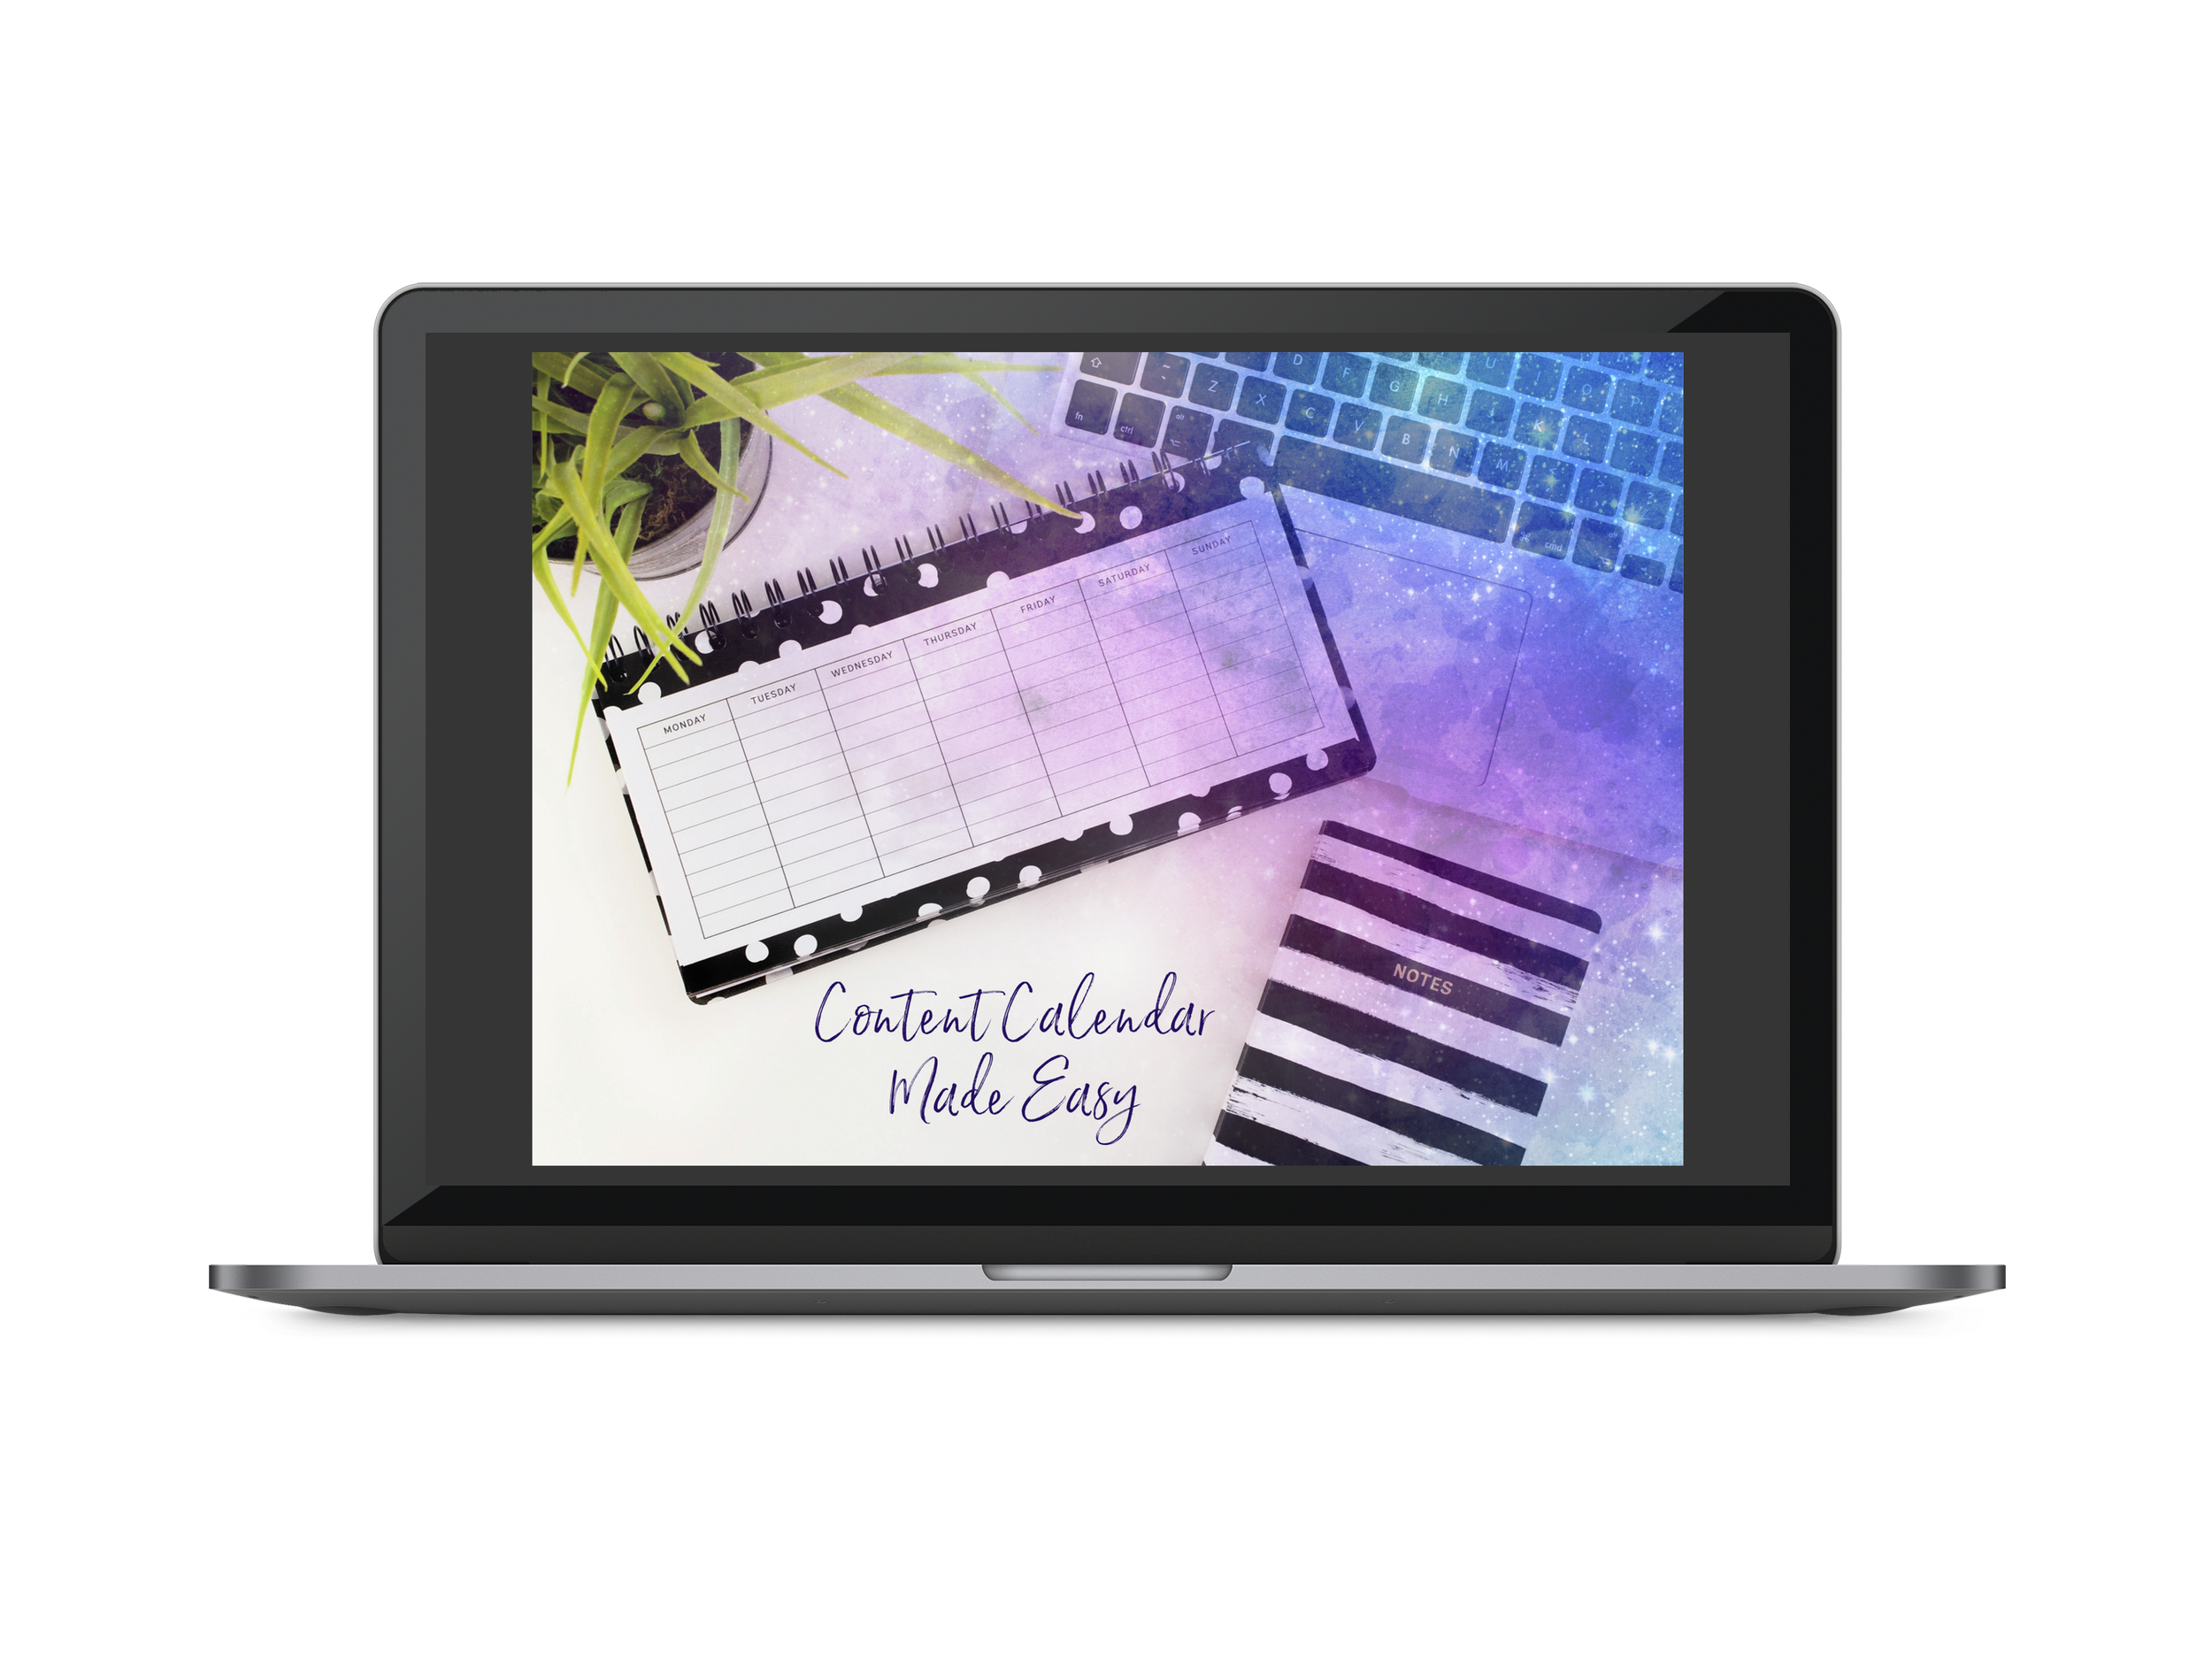 MacBook Design Mockup.png